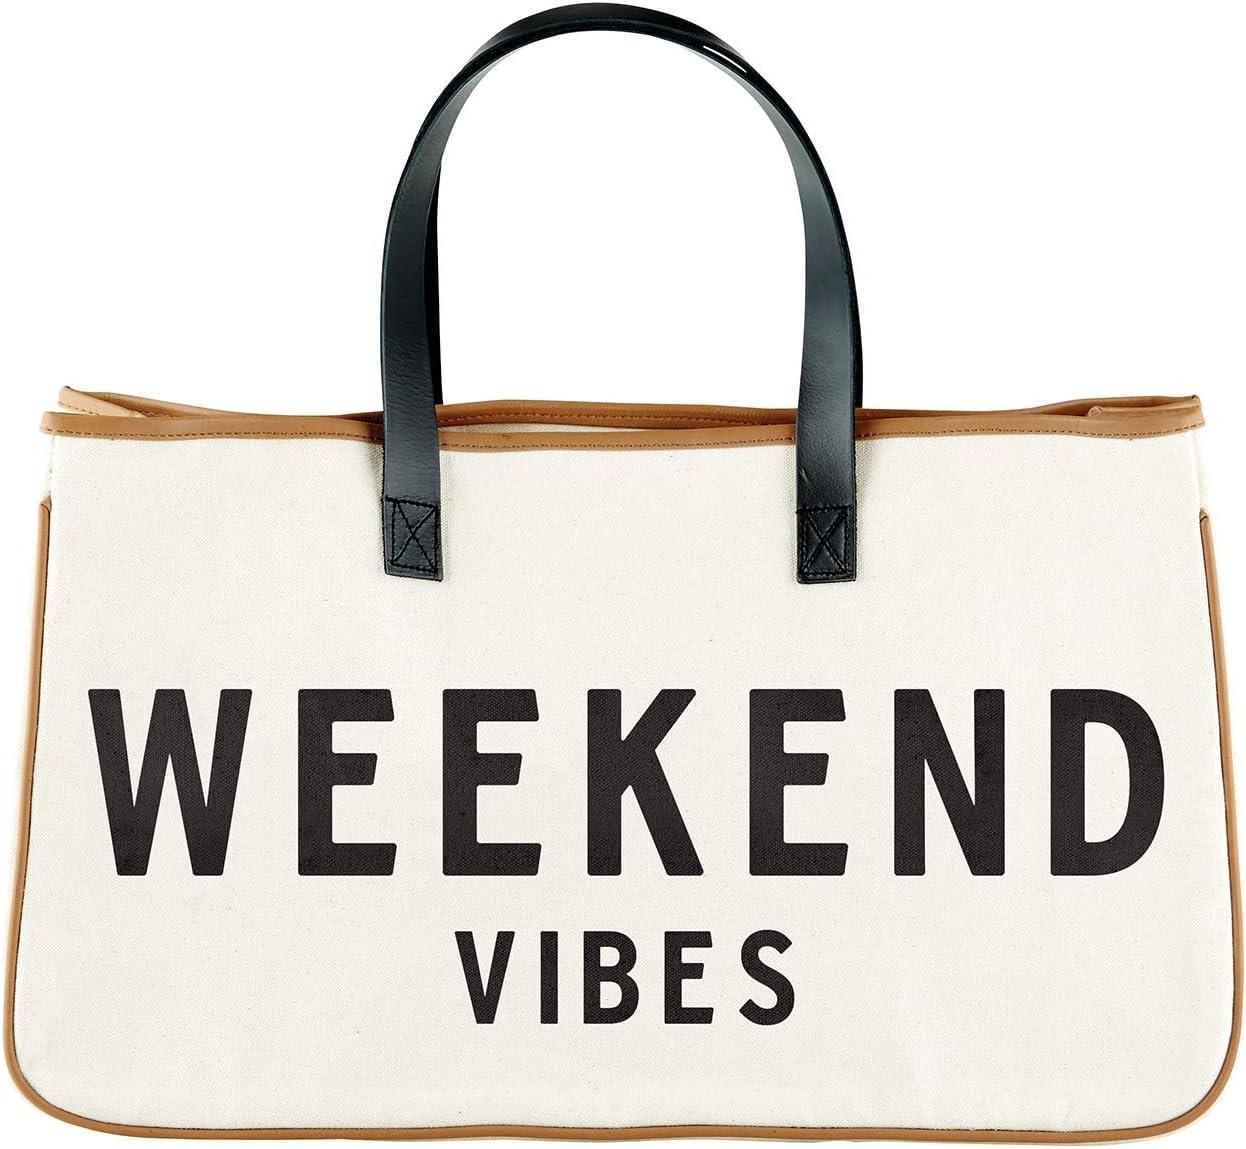 Overnight Bag Weekend Tote Bag Extra Large Vacation Bag Weekender Tote Bag Gift for Her Summer Pool Bag Oversized Beach Bag